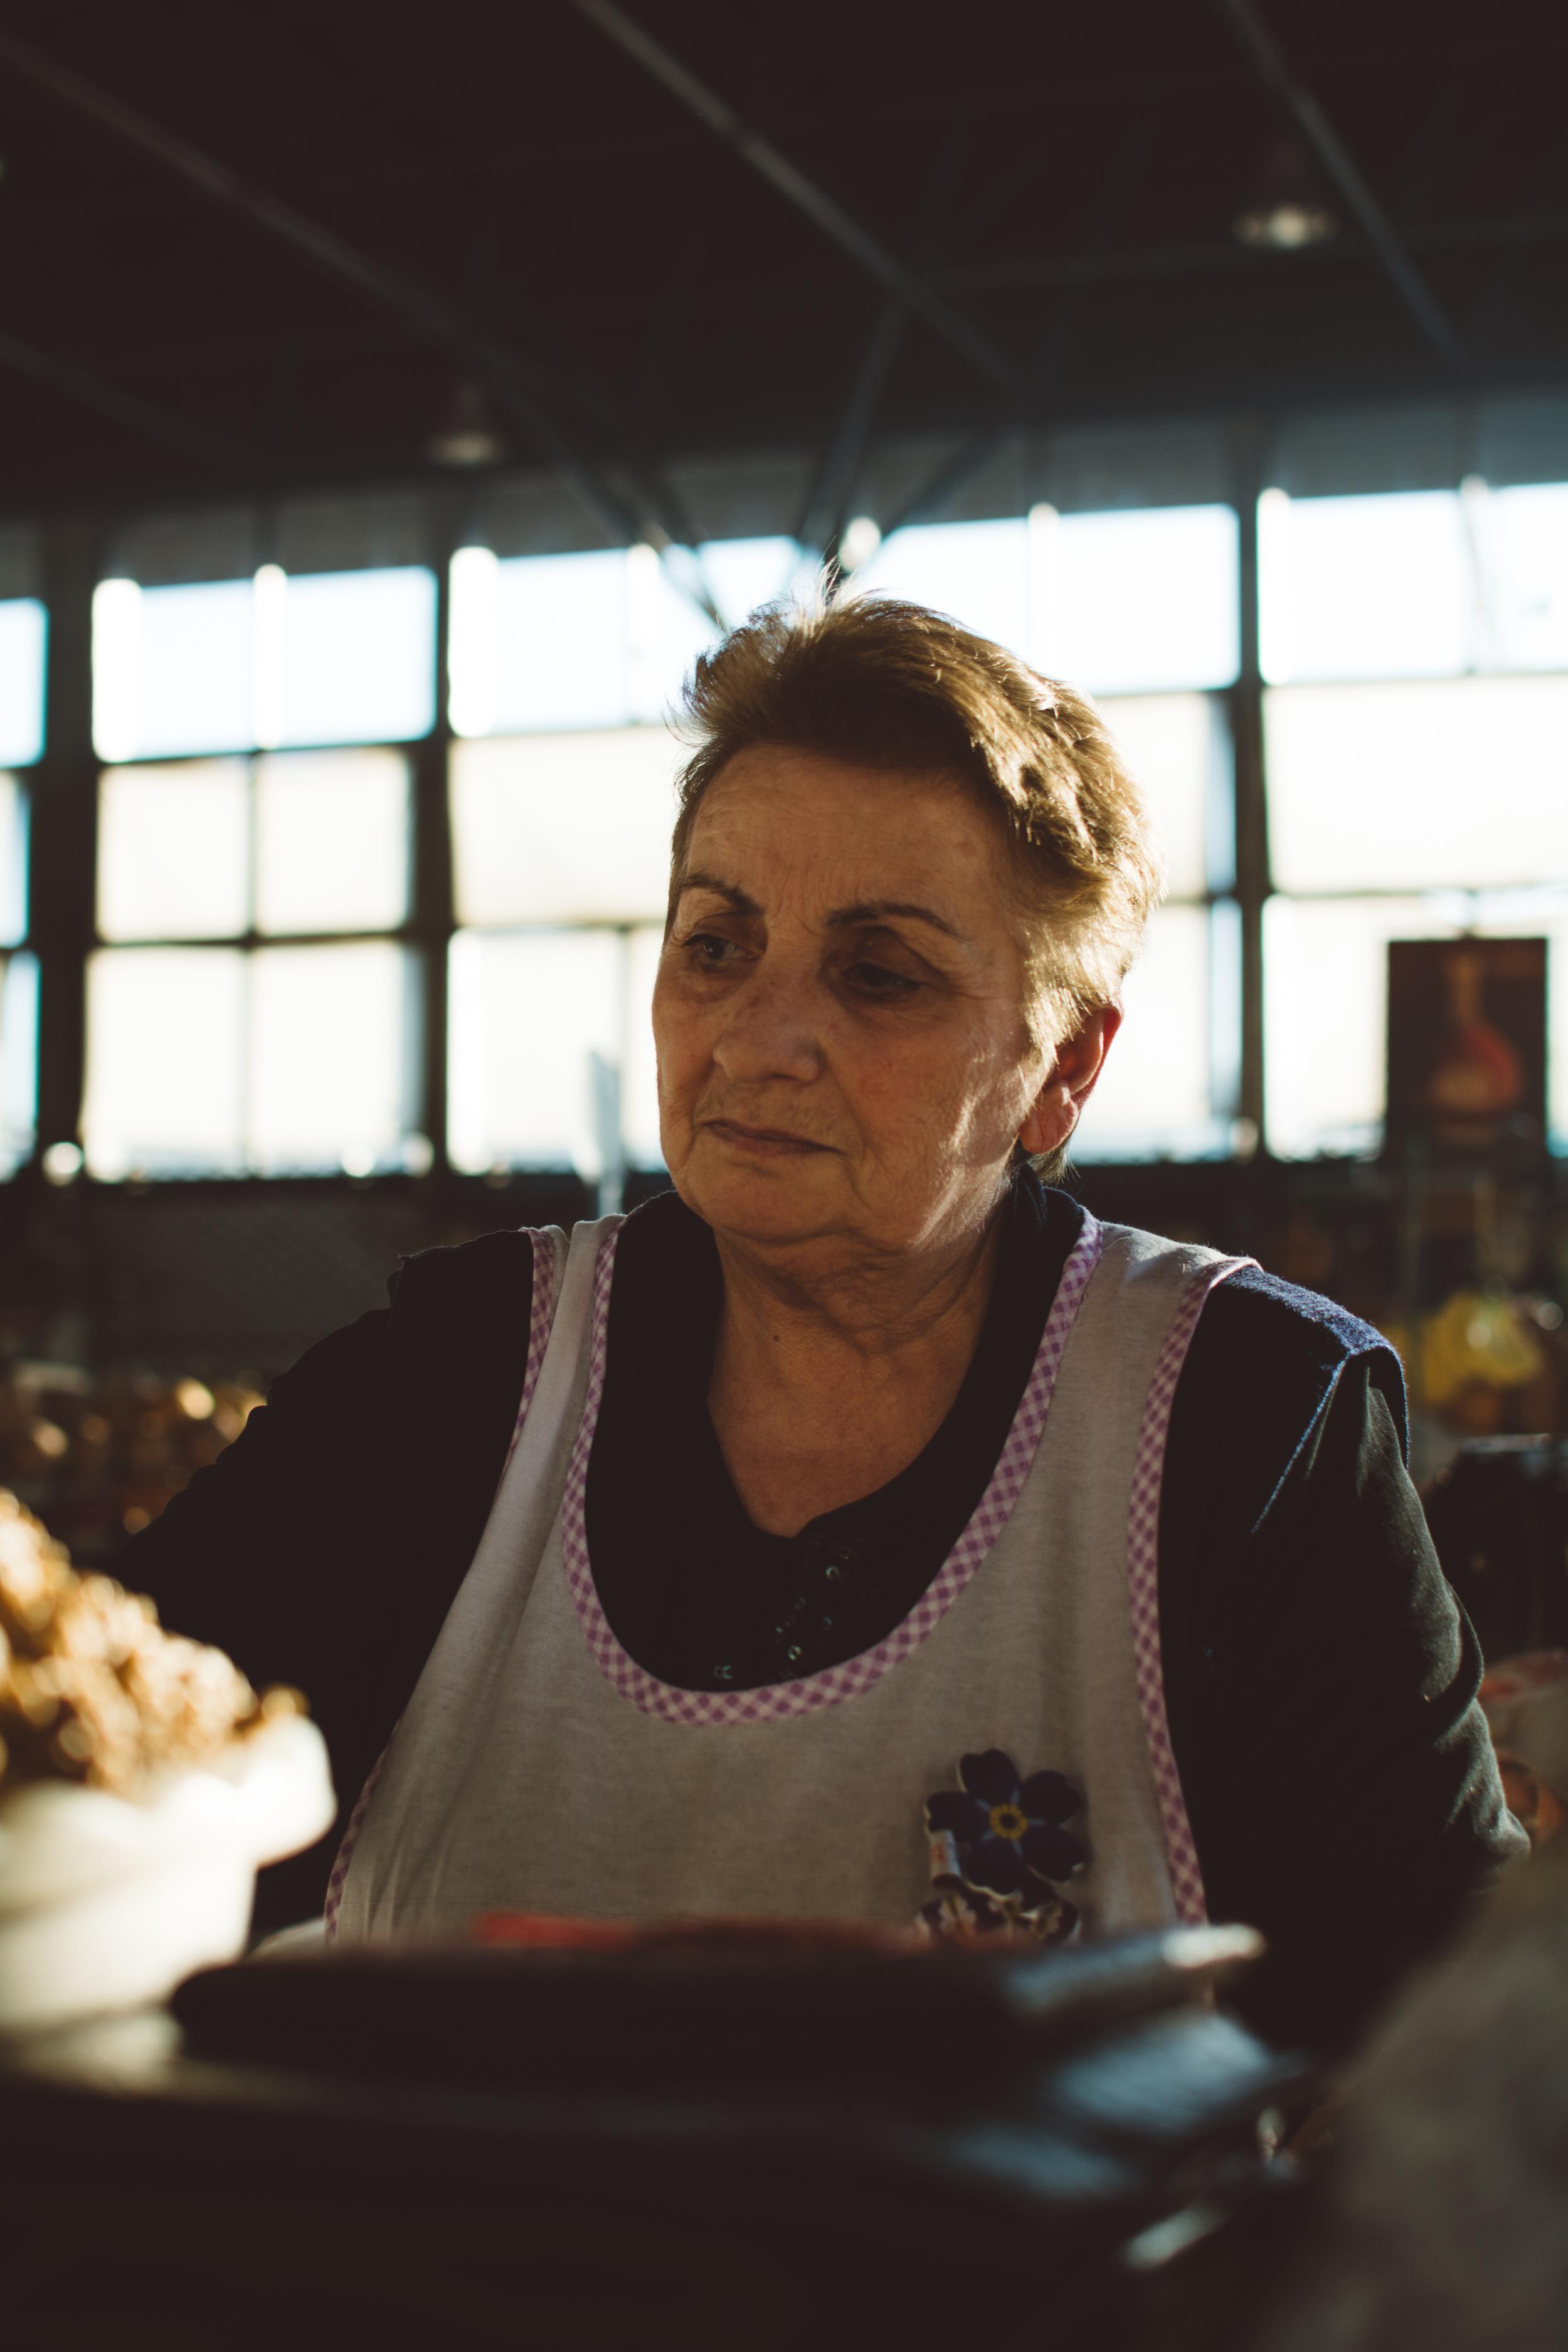 Market lady | Gabriella Simonian ©